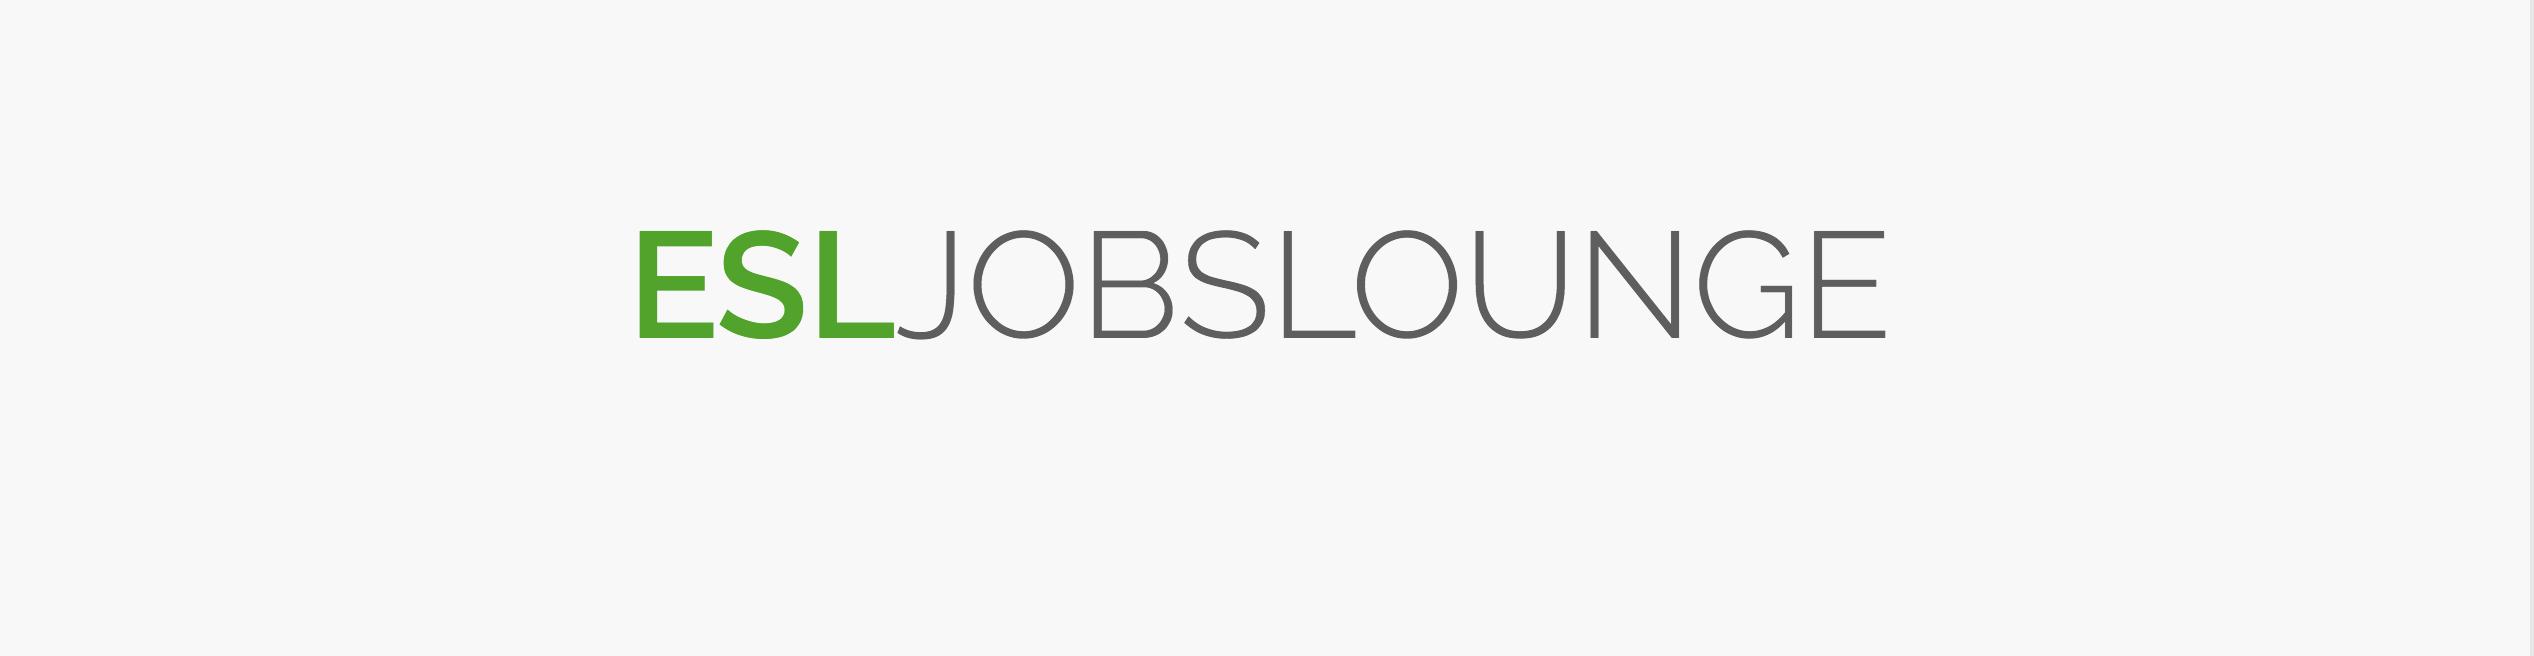 Beato App | ESL Jobs Lounge | Teach English Jobs Abroad | ESL Teaching JOBS